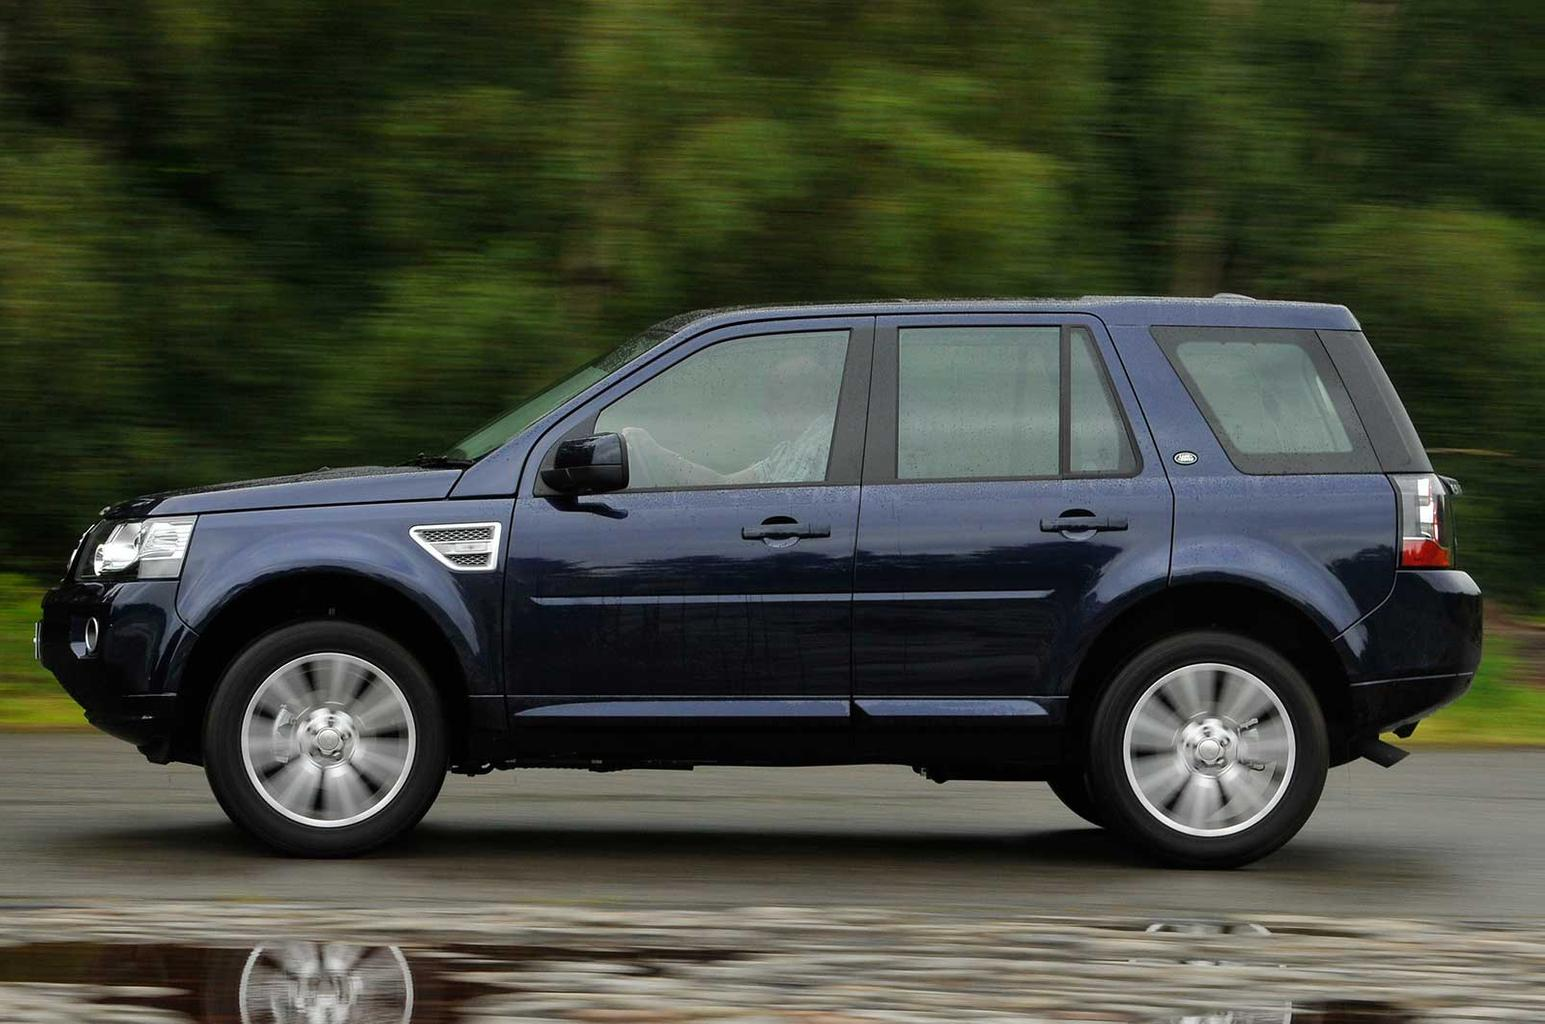 Used car of the week: Land Rover Freelander